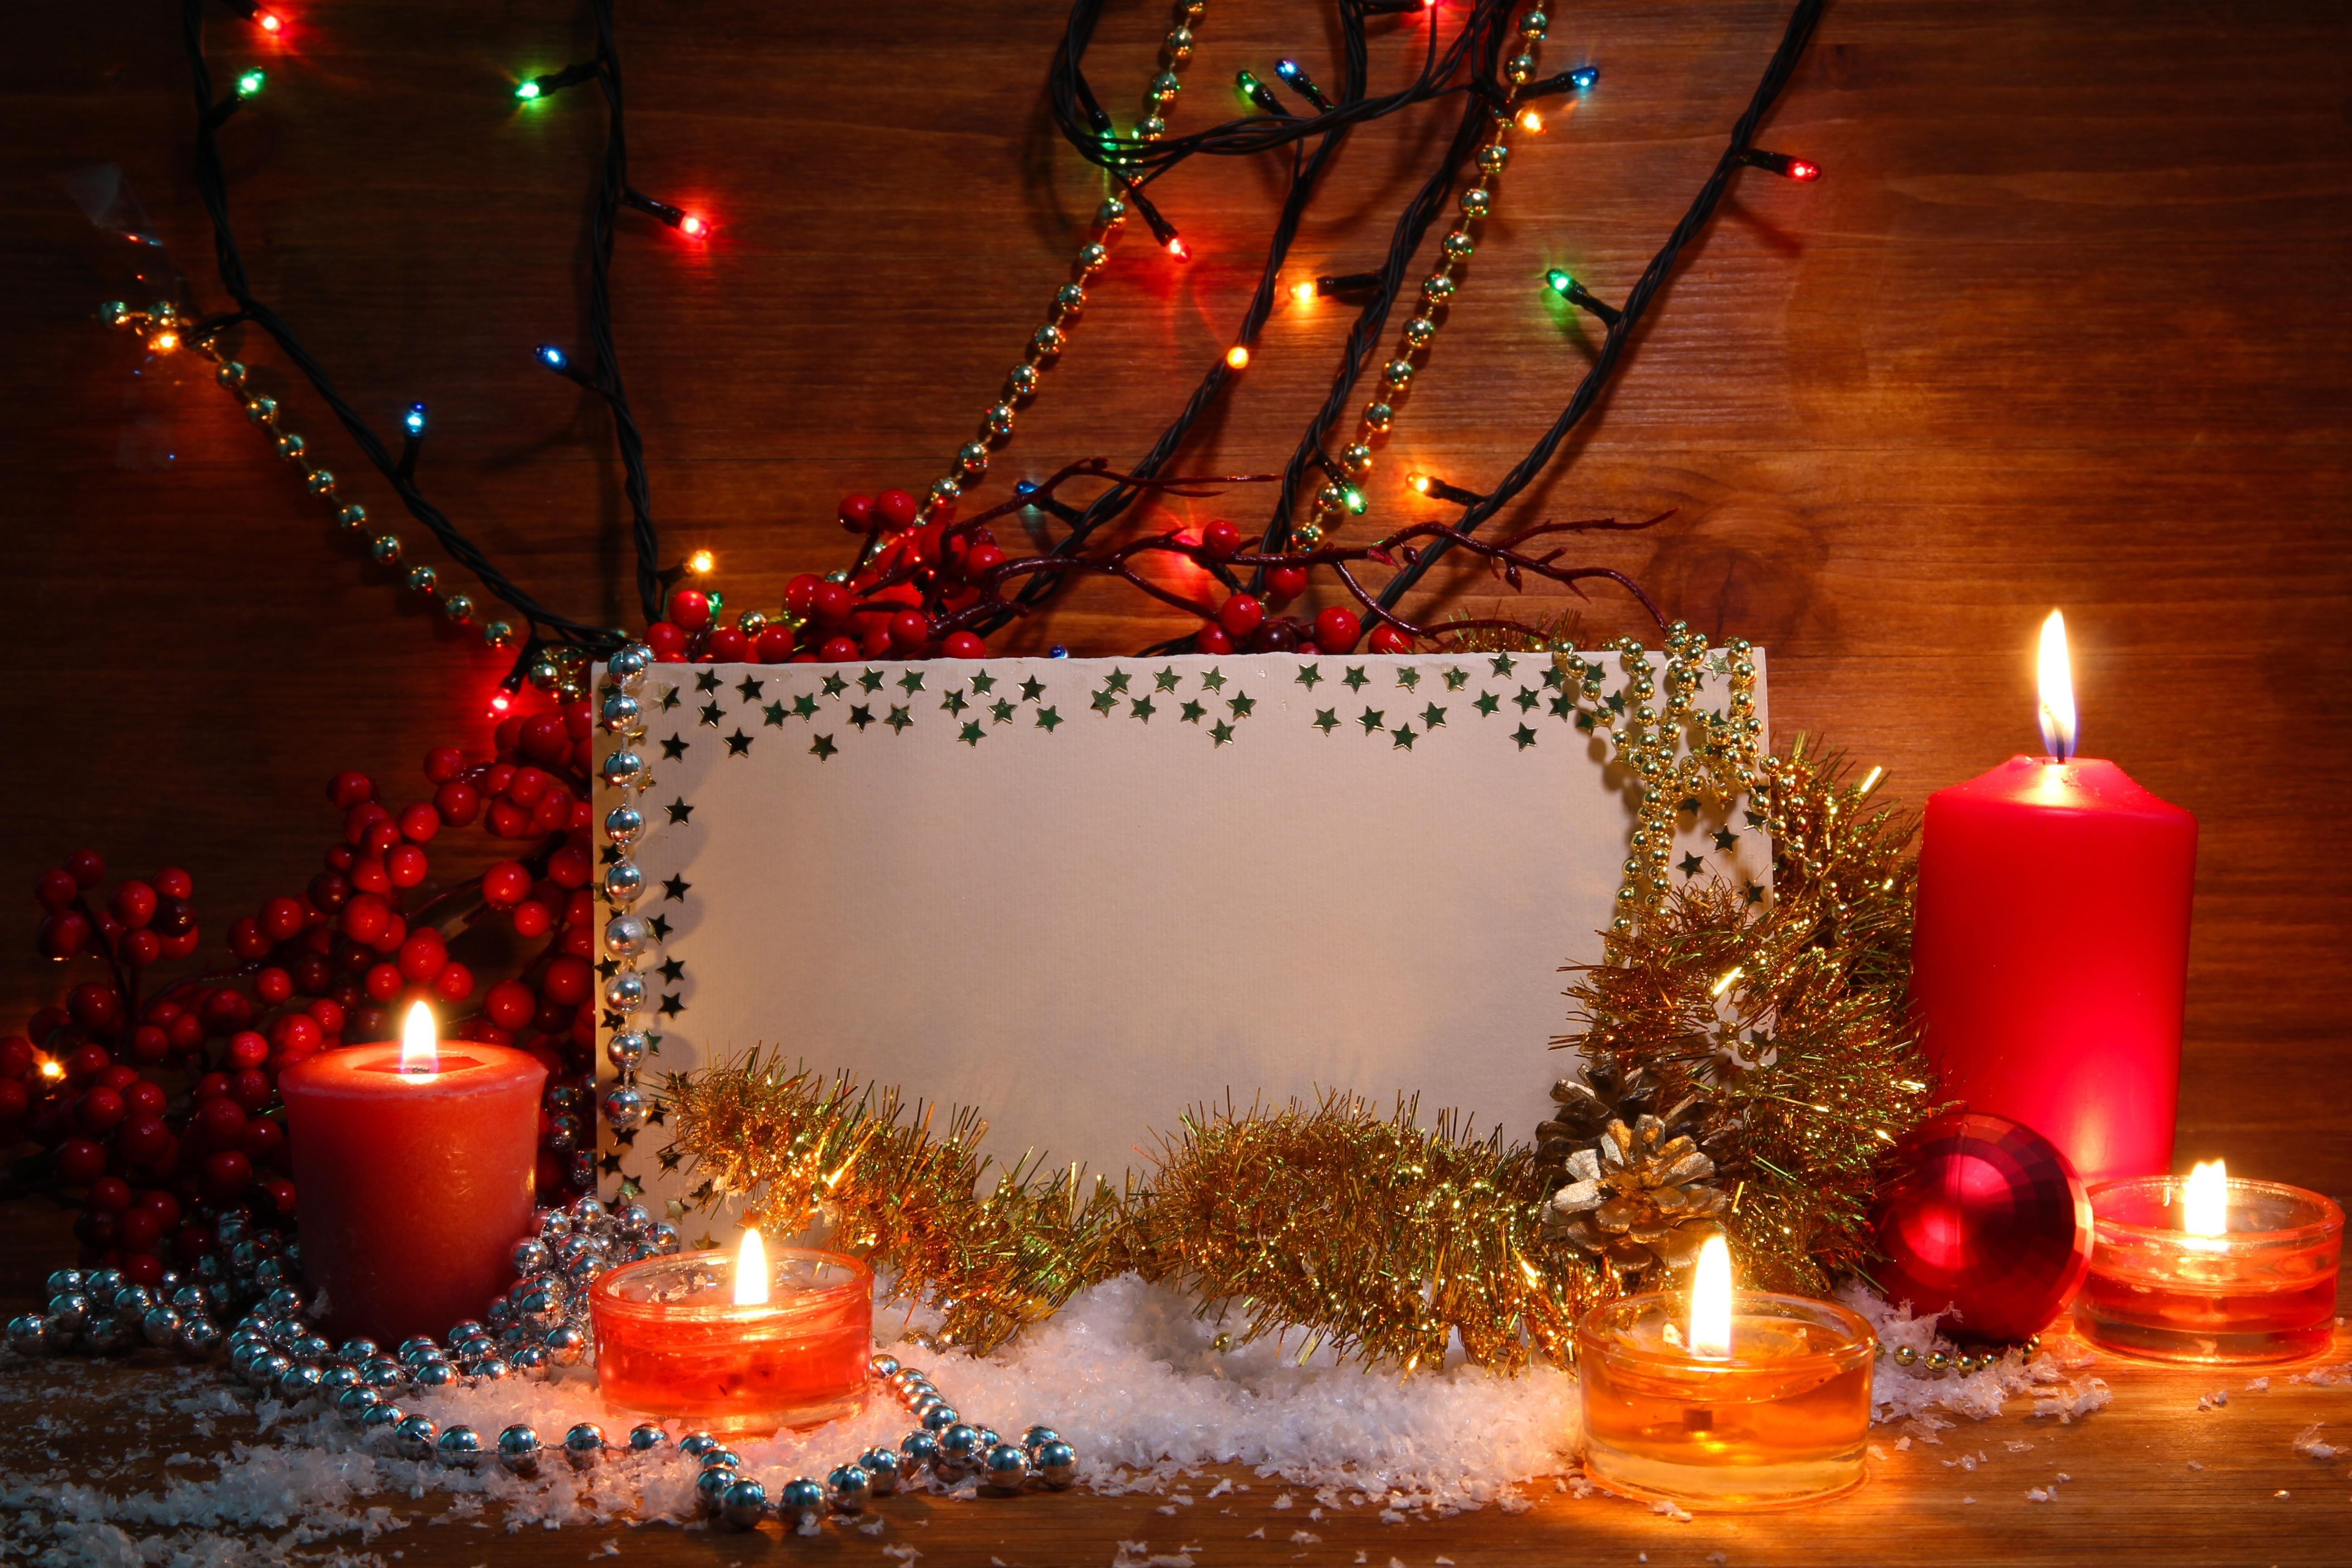 подарки новый год свечи корзинка gifts new year candles basket бесплатно